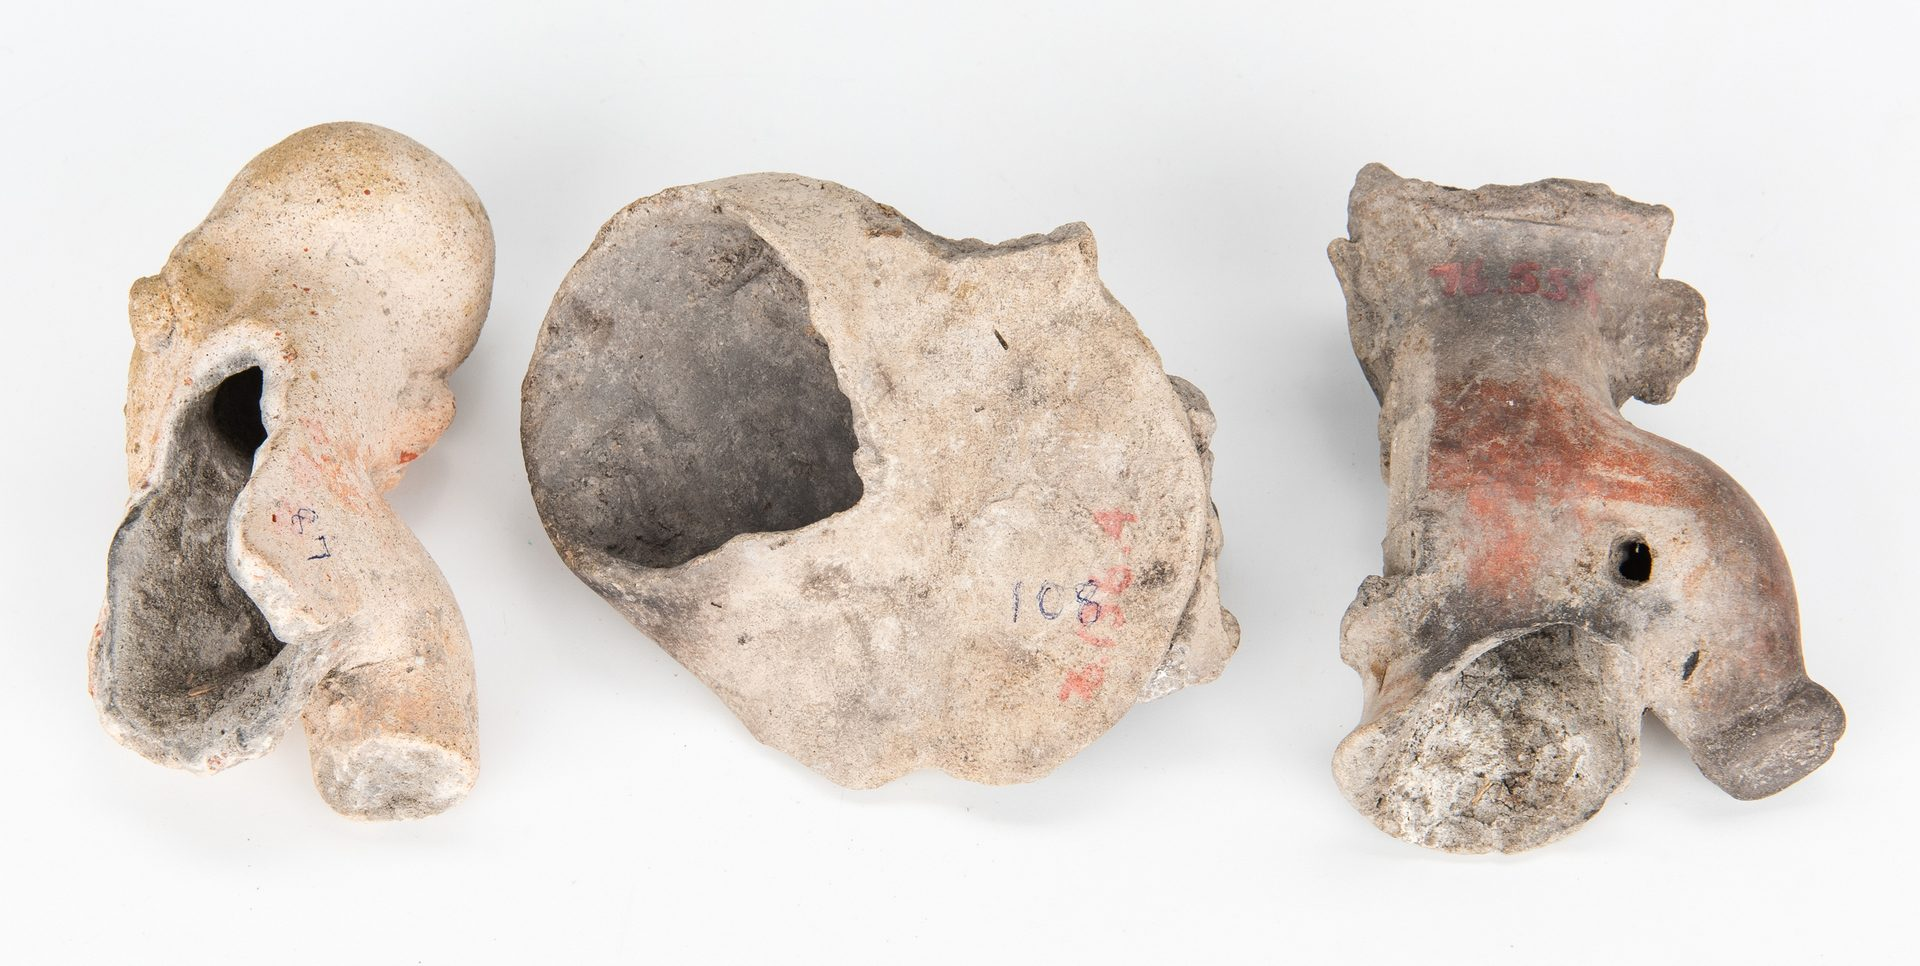 Lot 296: 21 Pre-Columbian Human Effigies, incl. Jama Coaque